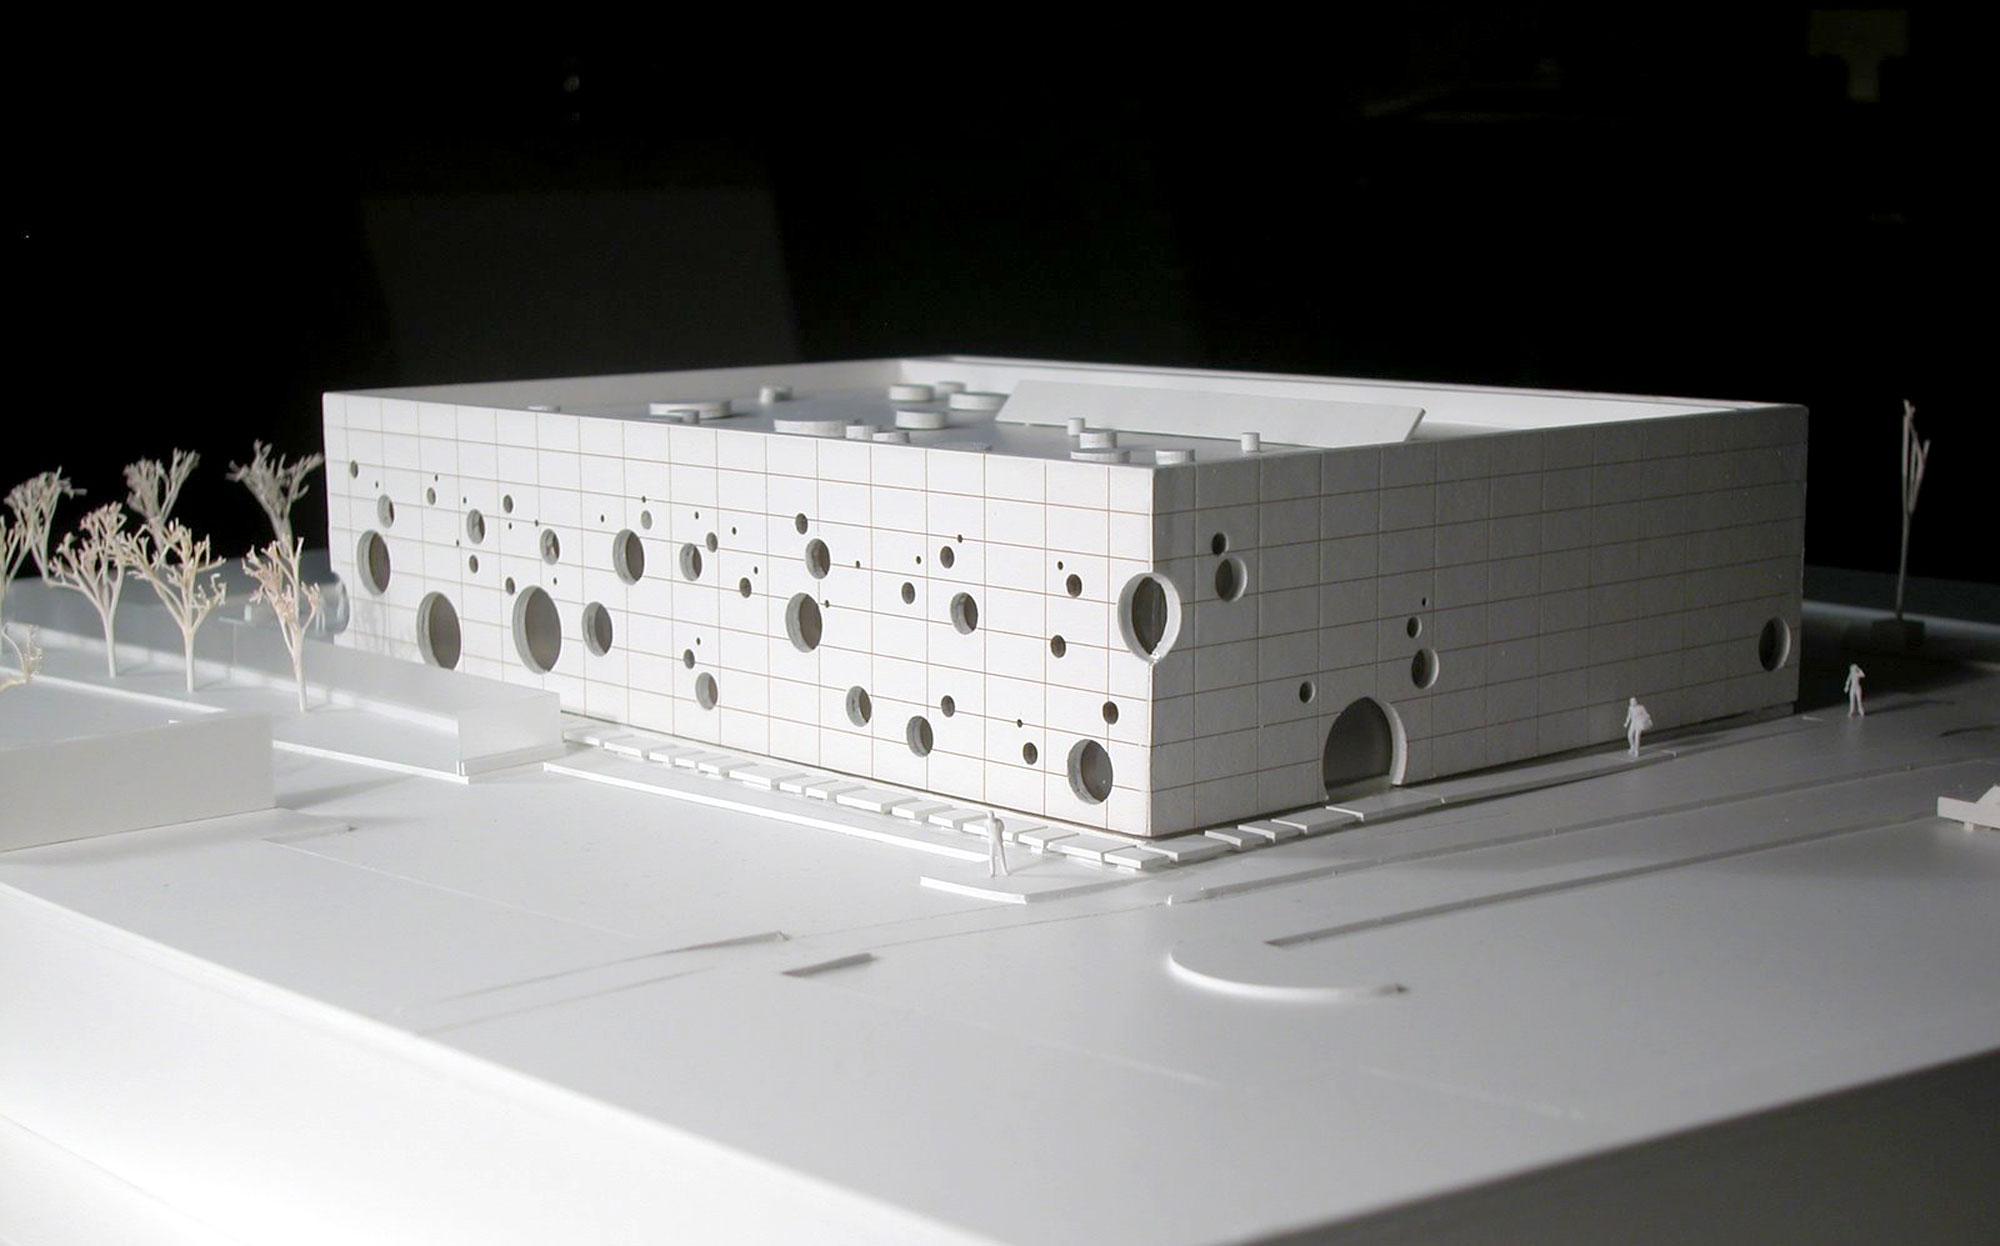 Projecto de Arquitectura Piscinas e salas Carcavelos | Arquitectura, Arquitecto Lisboa, Projecto arquitectura Lisboa, Arquitecto Lisboa, Arquitecto, Gabinete de Arquitetura Lisboa